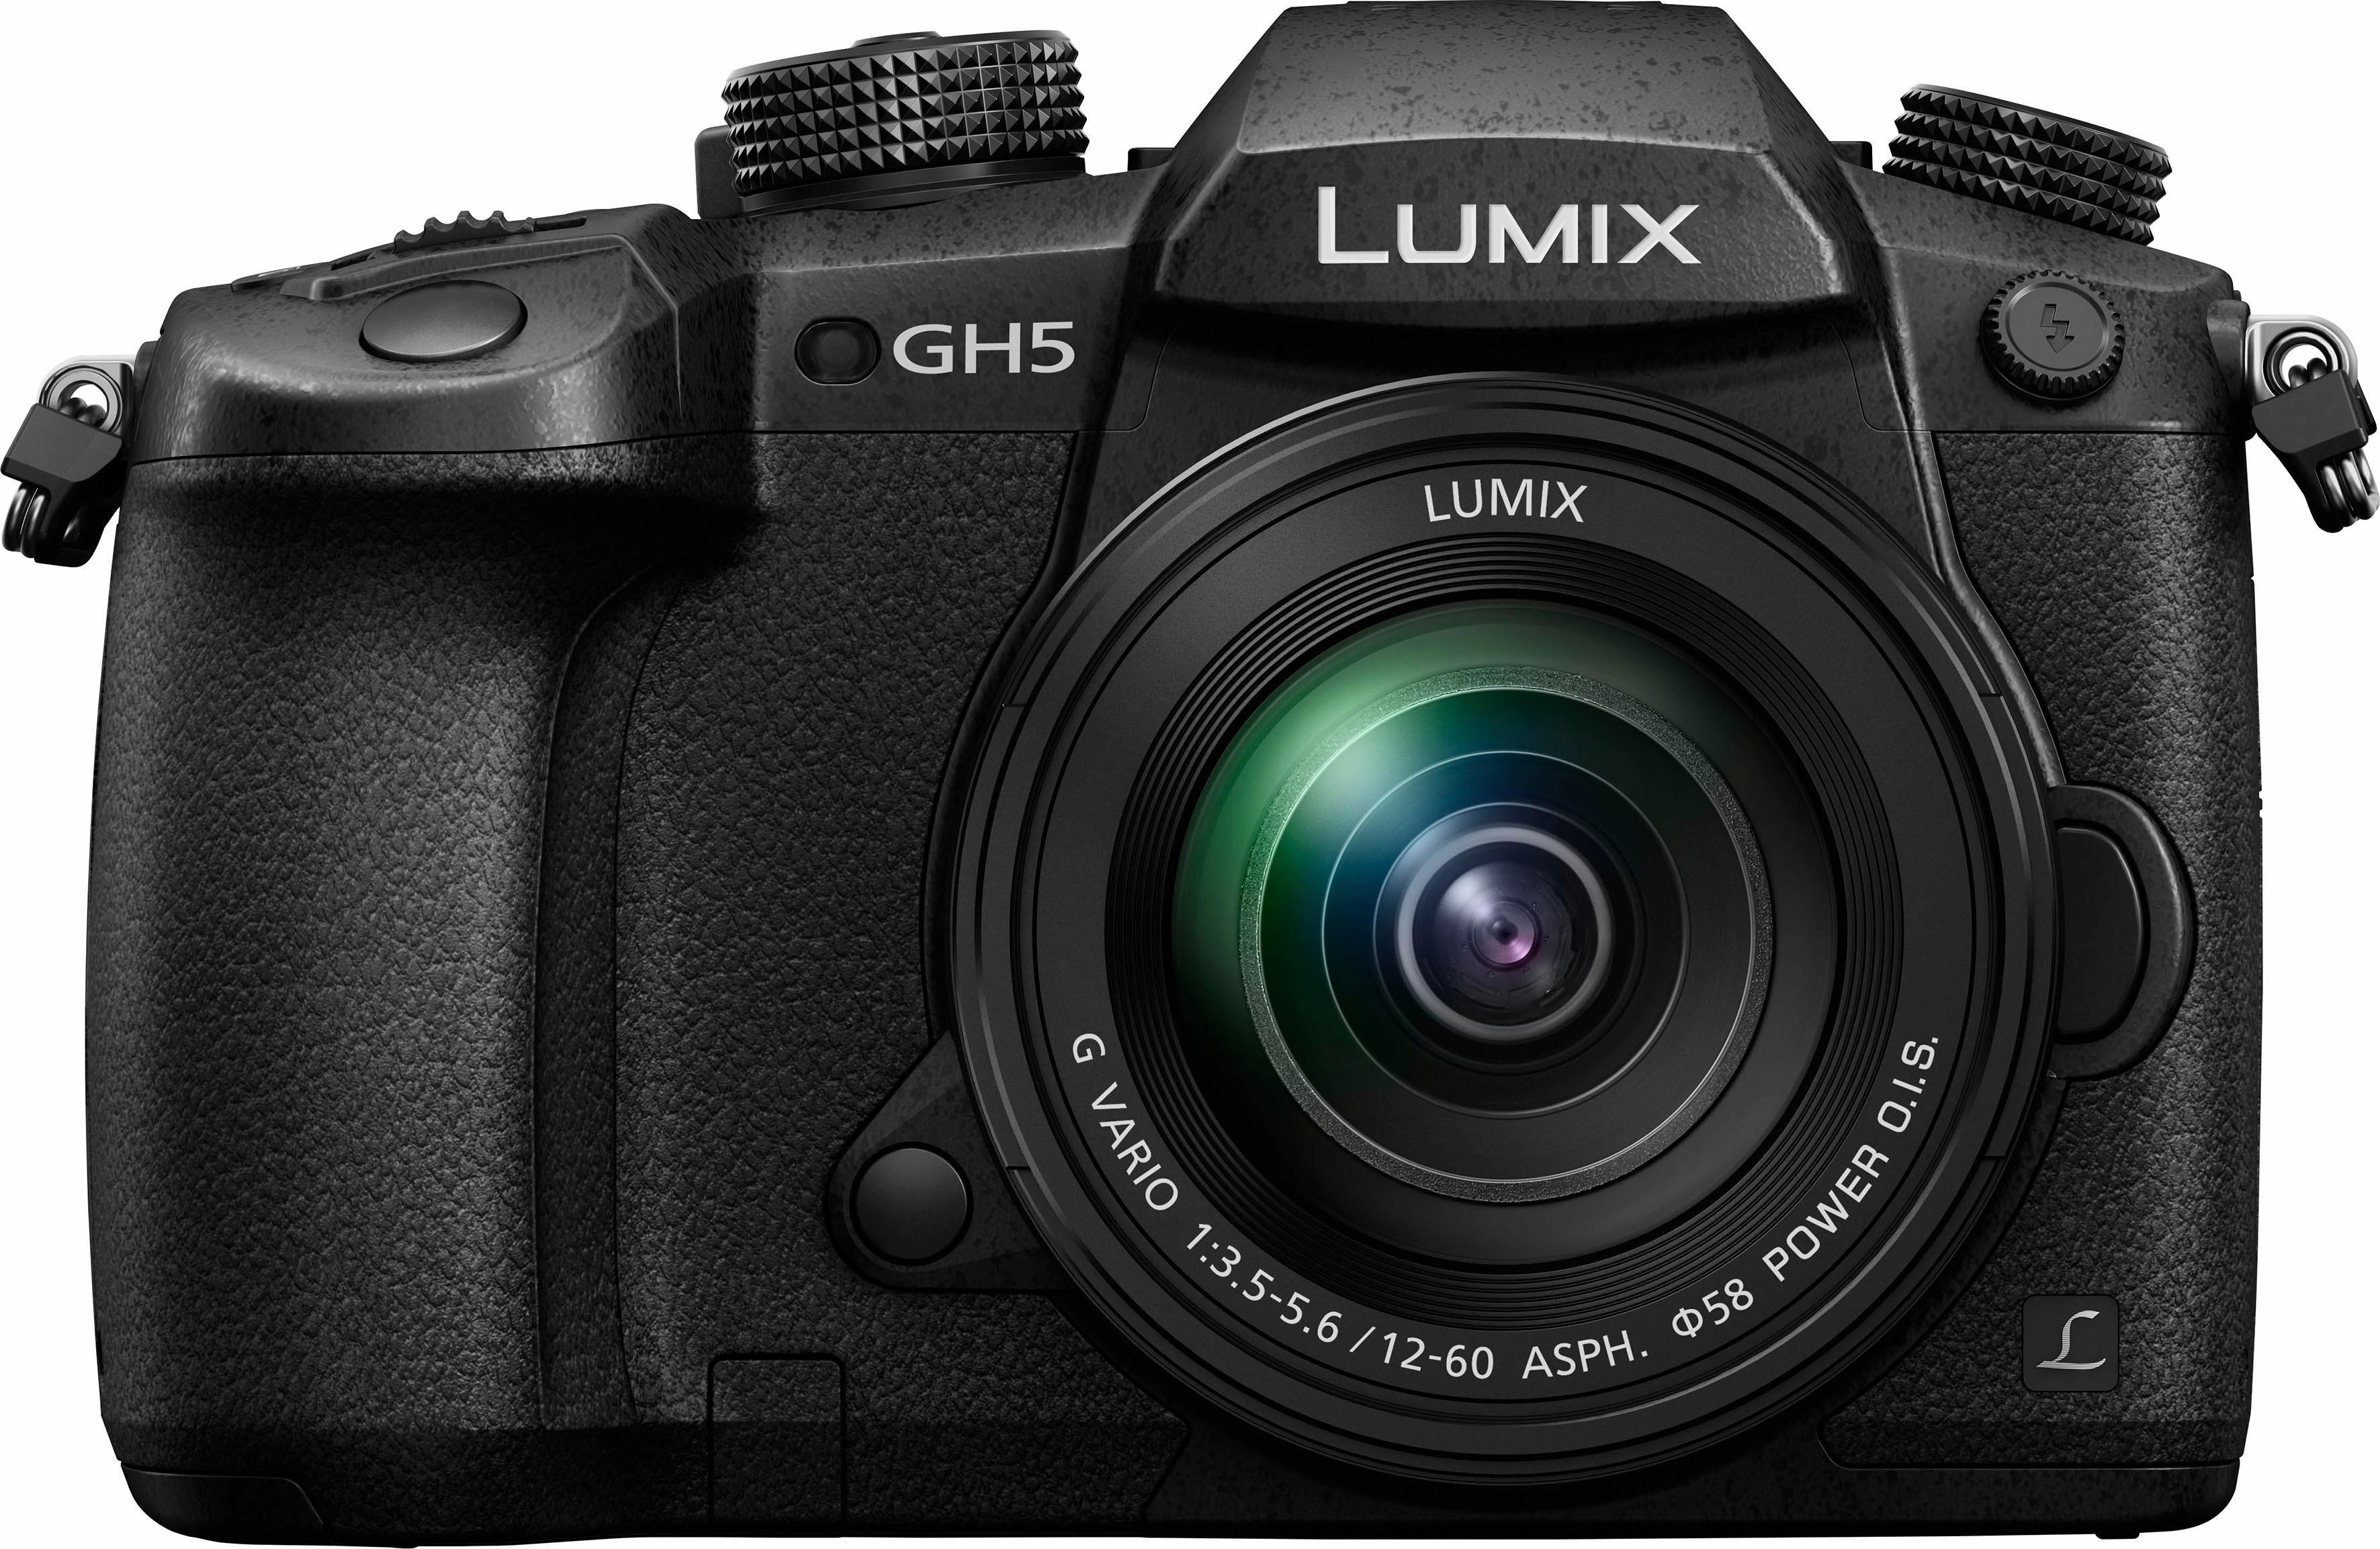 Panasonic DM-GH5MEG-K Systemkamera inkl. H-FS12060 Weitwinkel Objektiv